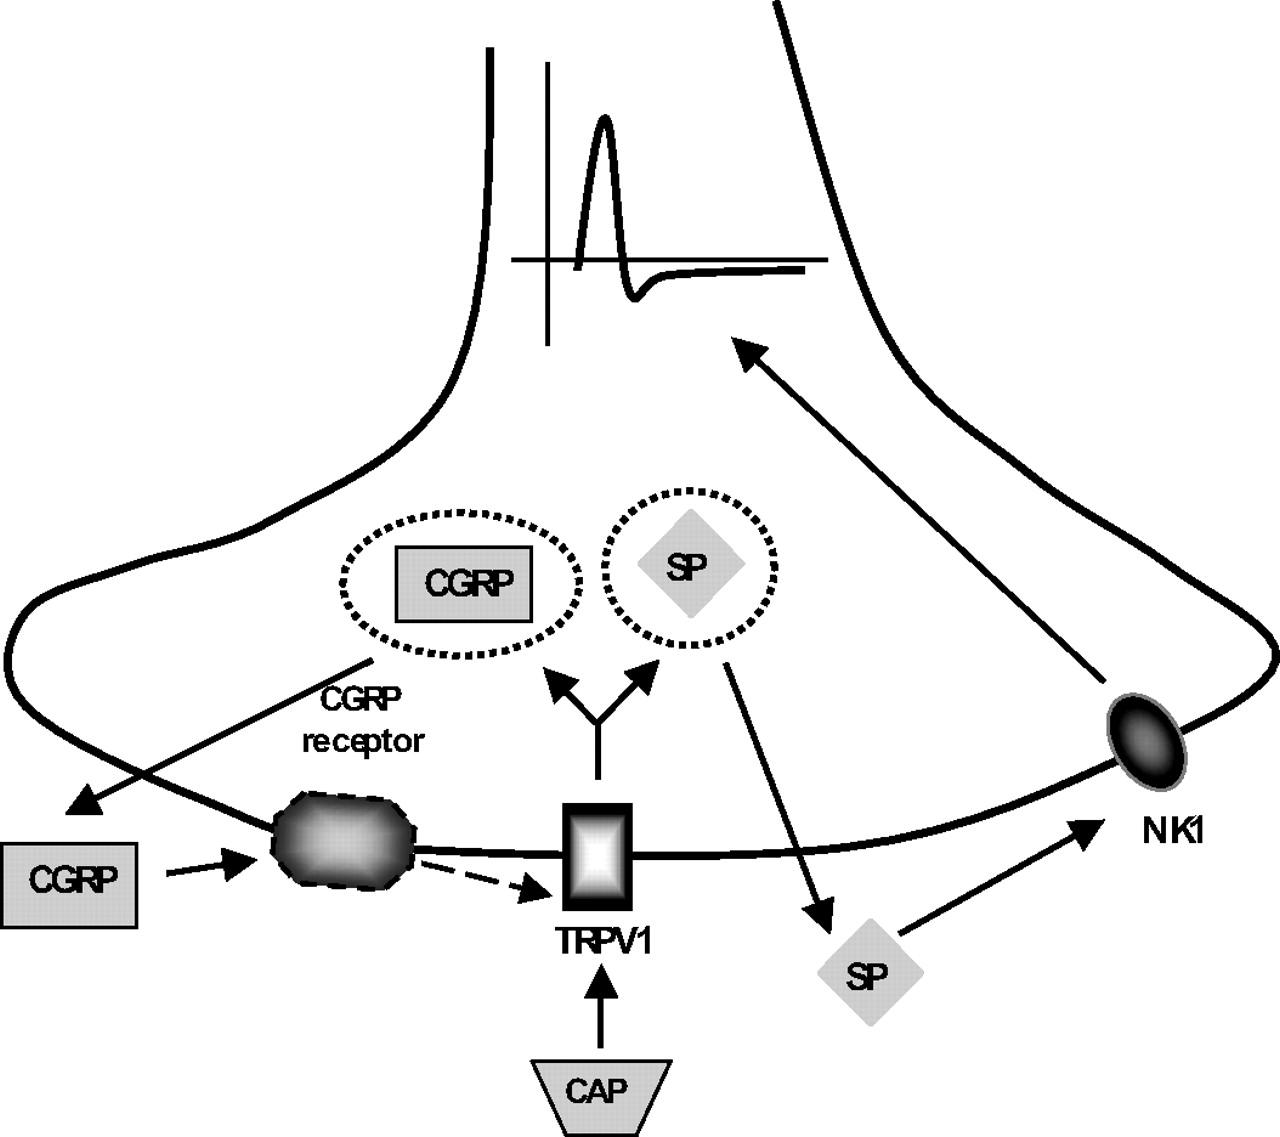 Interdependent Regulation Of Afferent Renal Nerve Activity And Renal